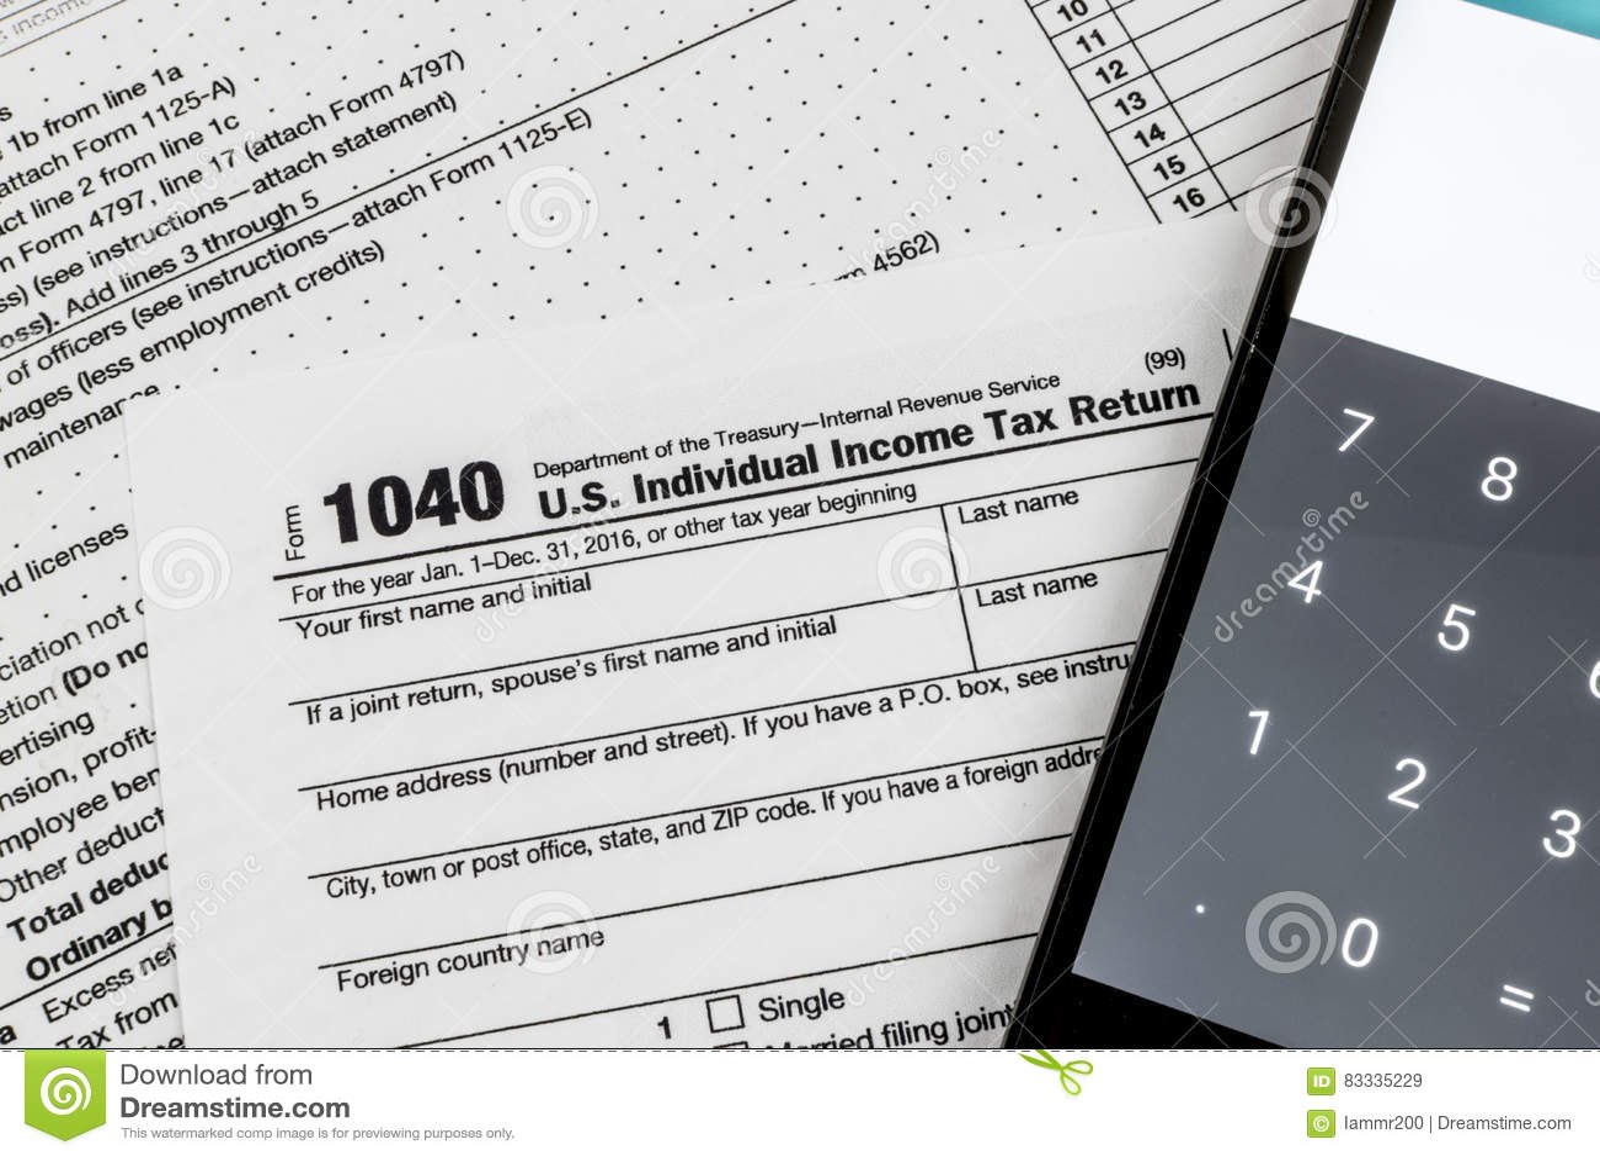 Internal Revenue Service IRS Form 1040 - US Individual Income ...